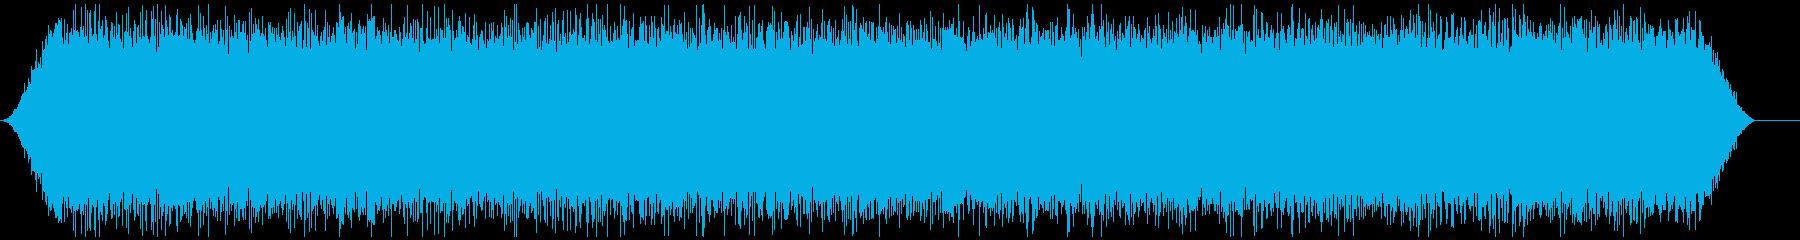 EXT:水槽オーバーフロー、システ...の再生済みの波形